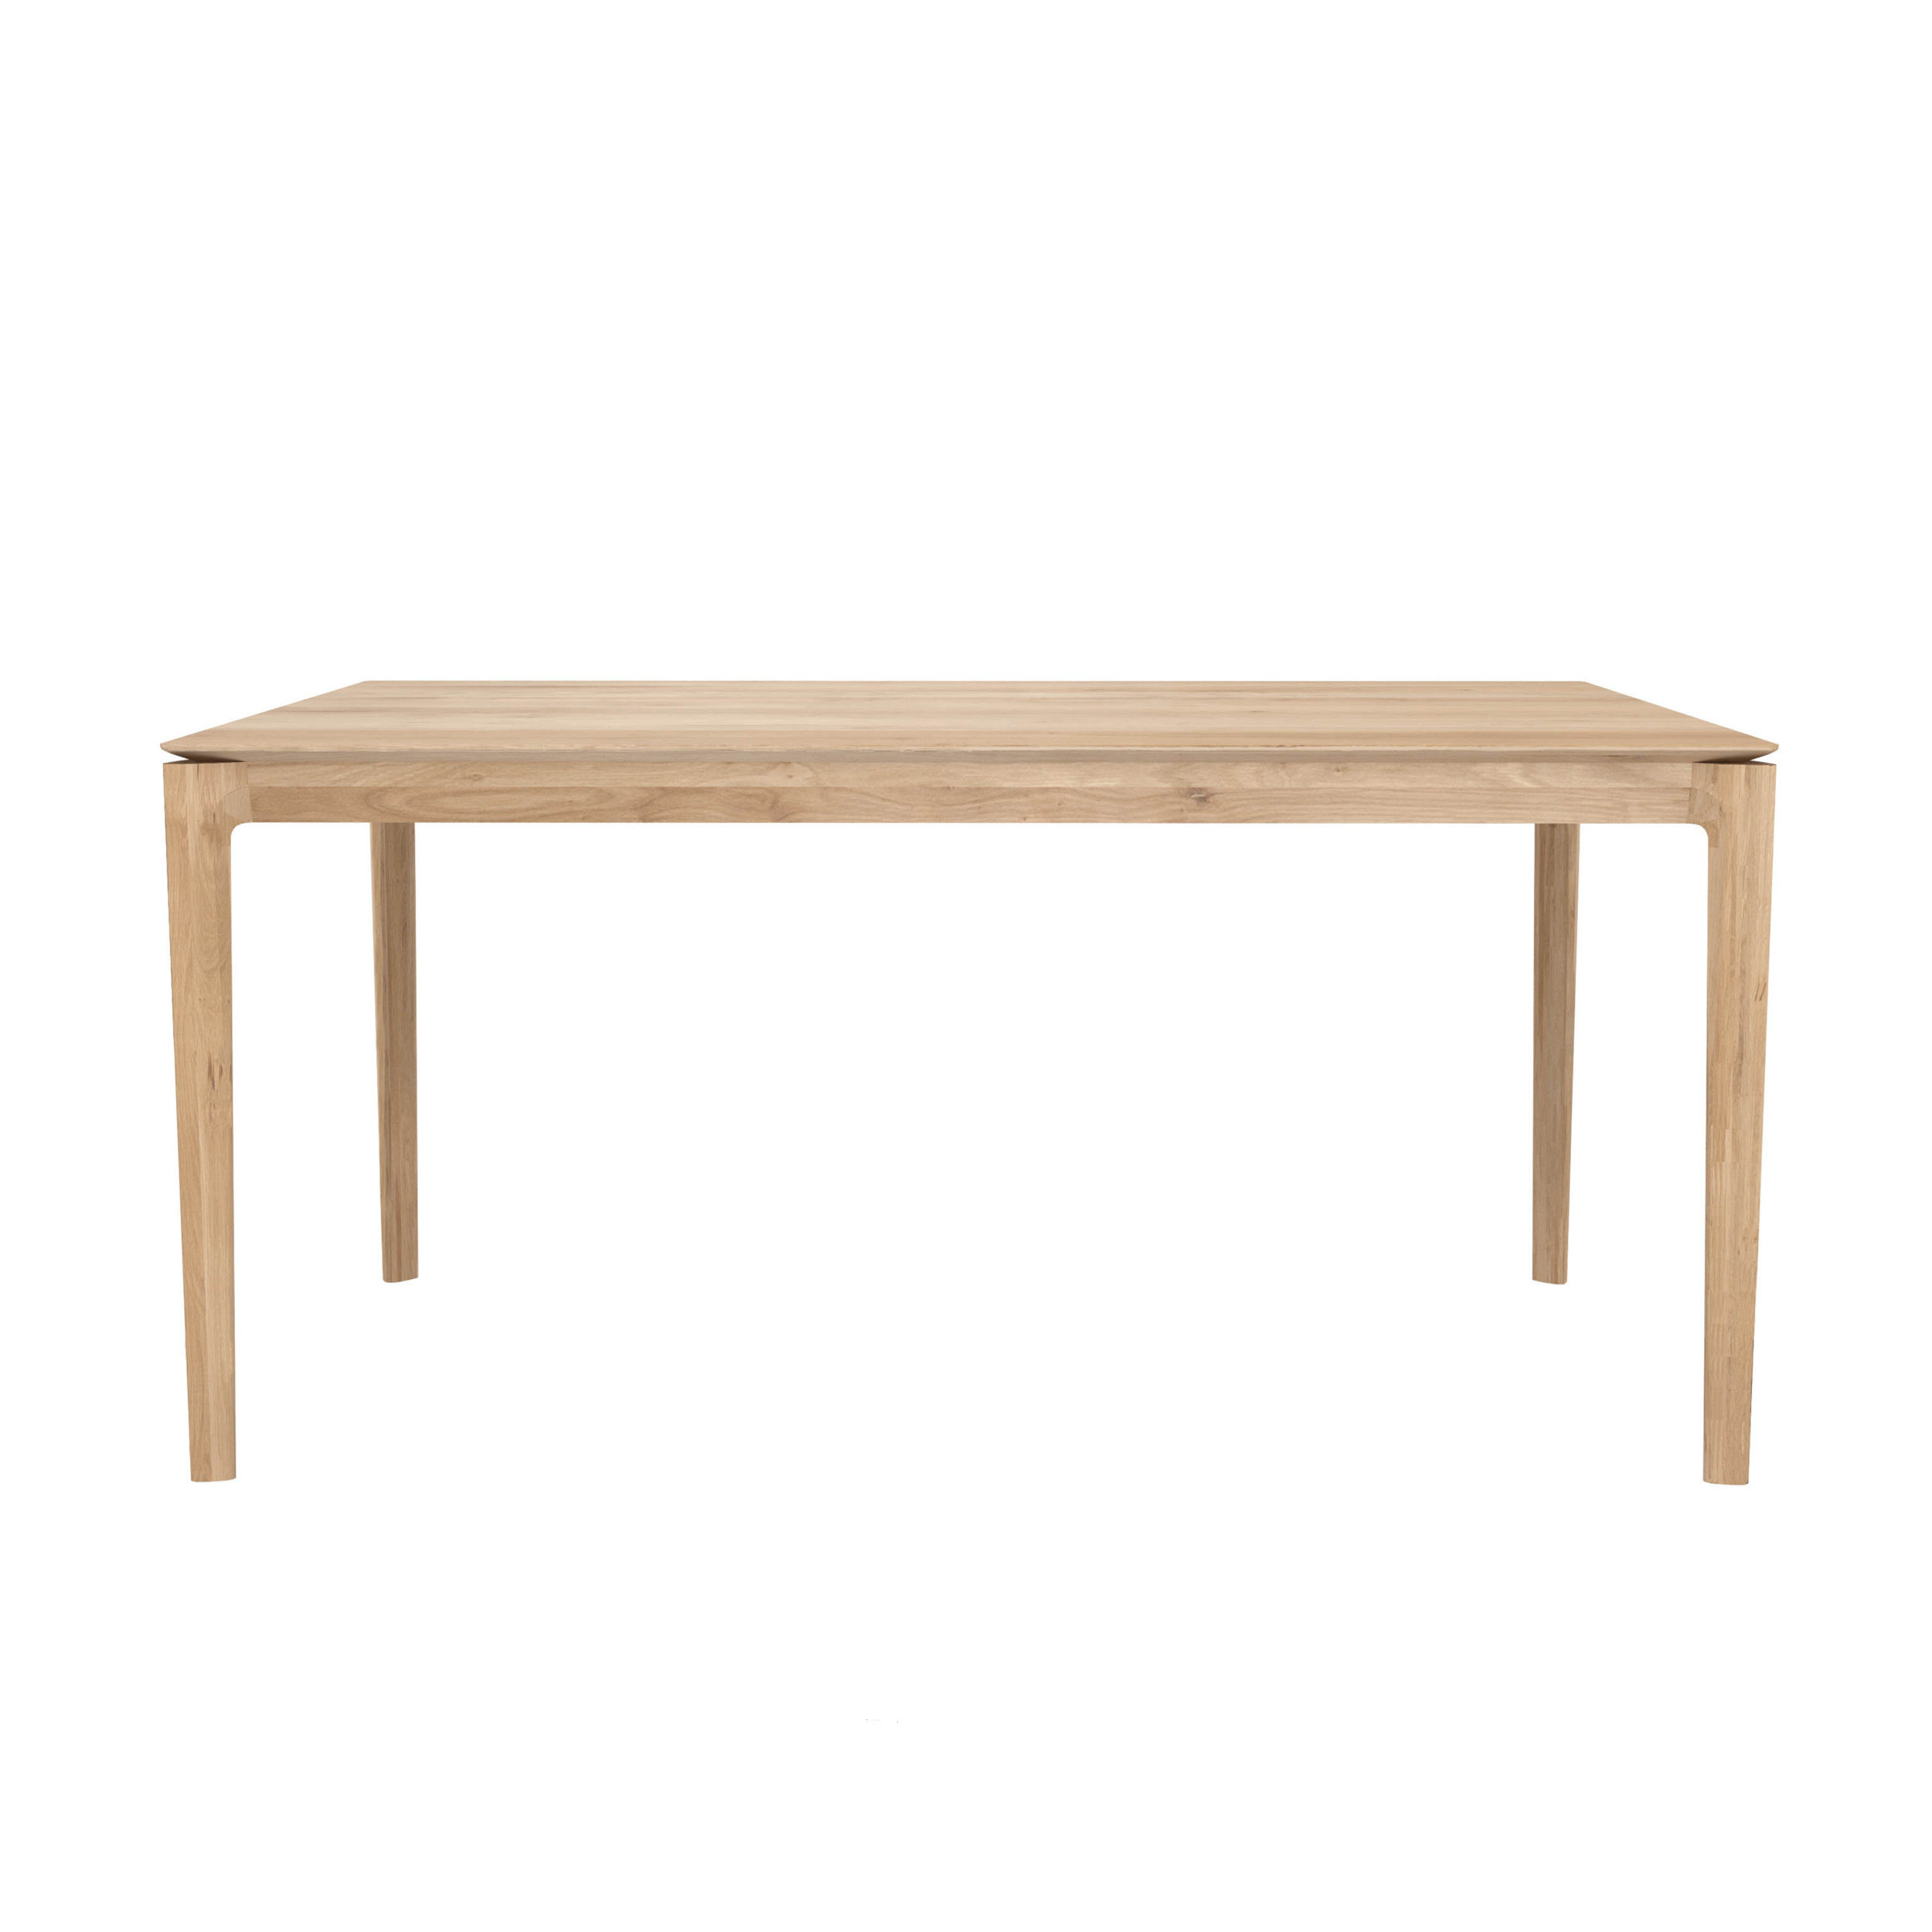 51495 Bok dining table - Oak.jpg.png